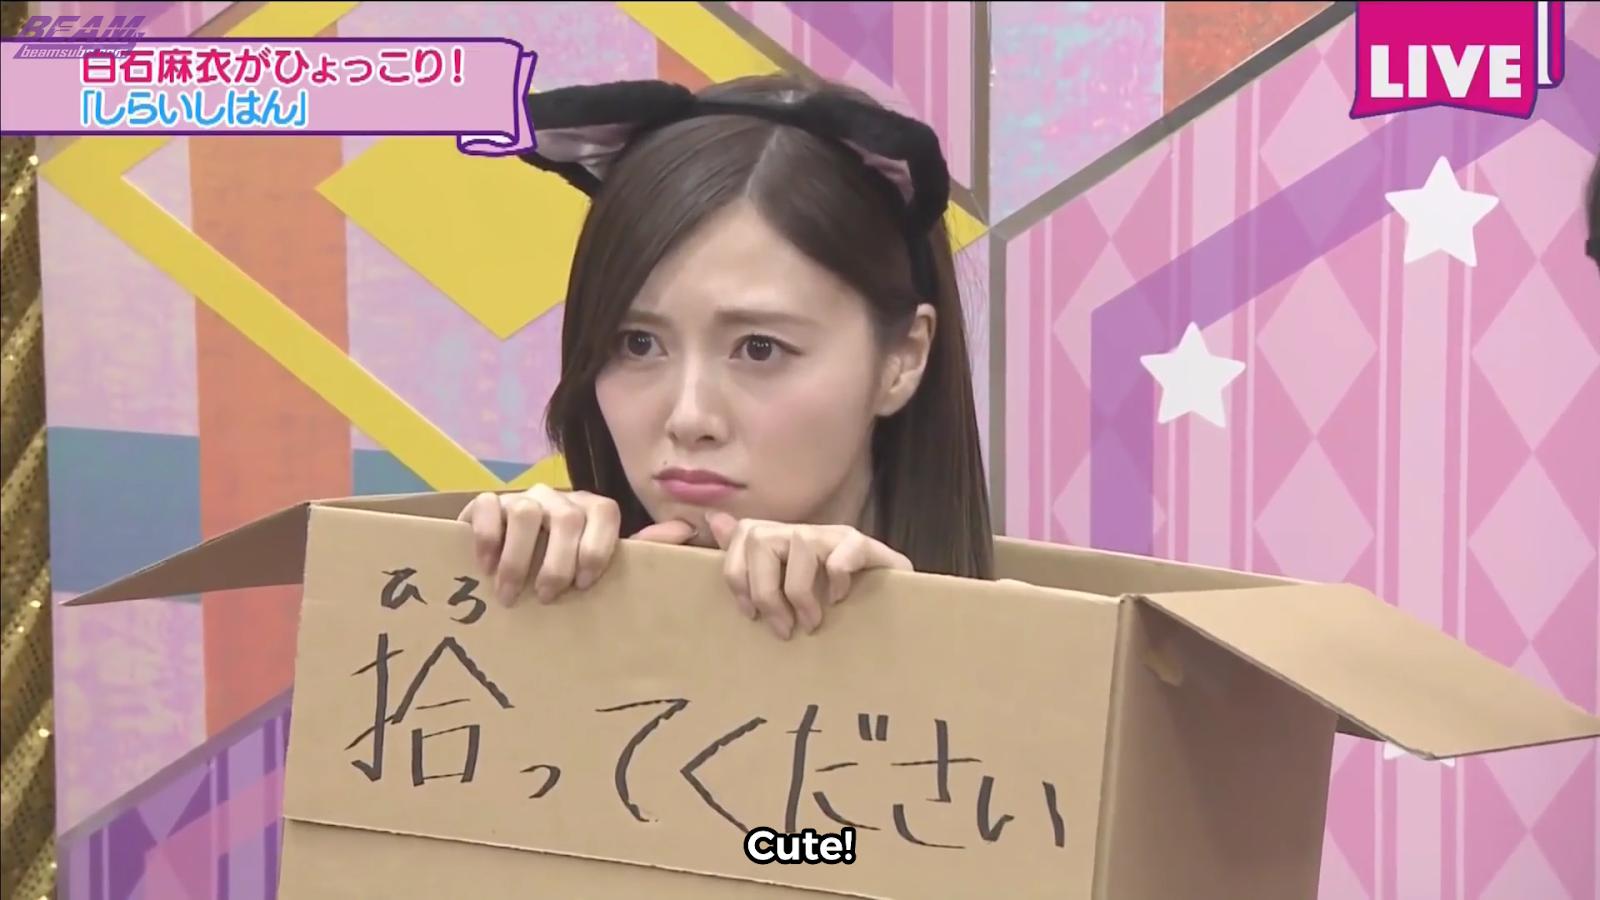 46hr TV - Shiraishi Mai's Hyokkori (English and Spanish